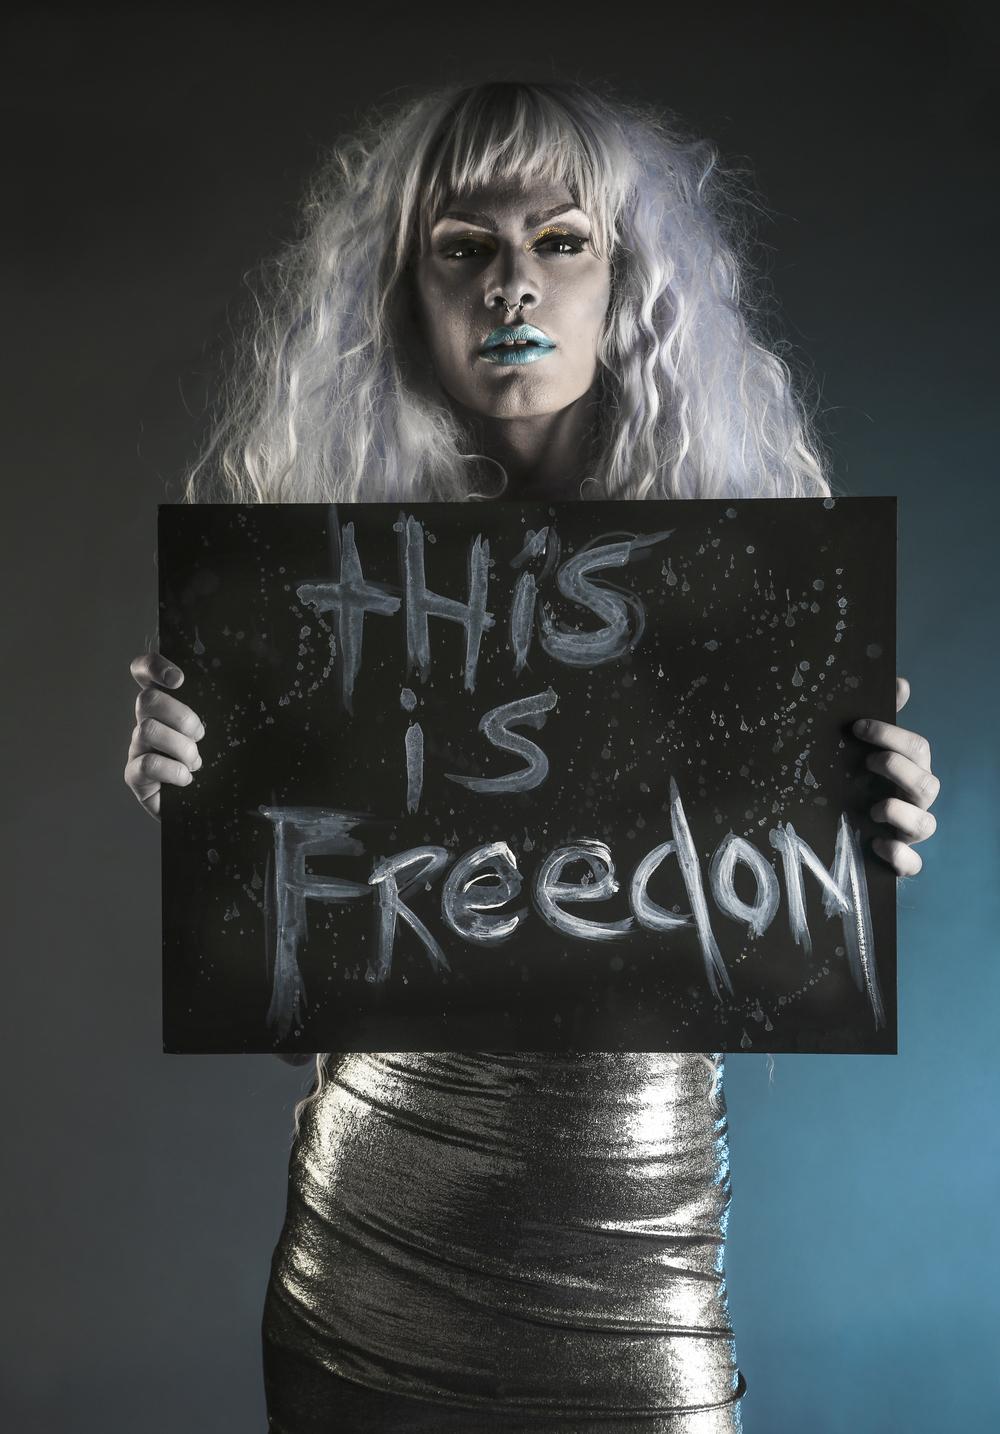 FREEDOM-2-Edit.jpg